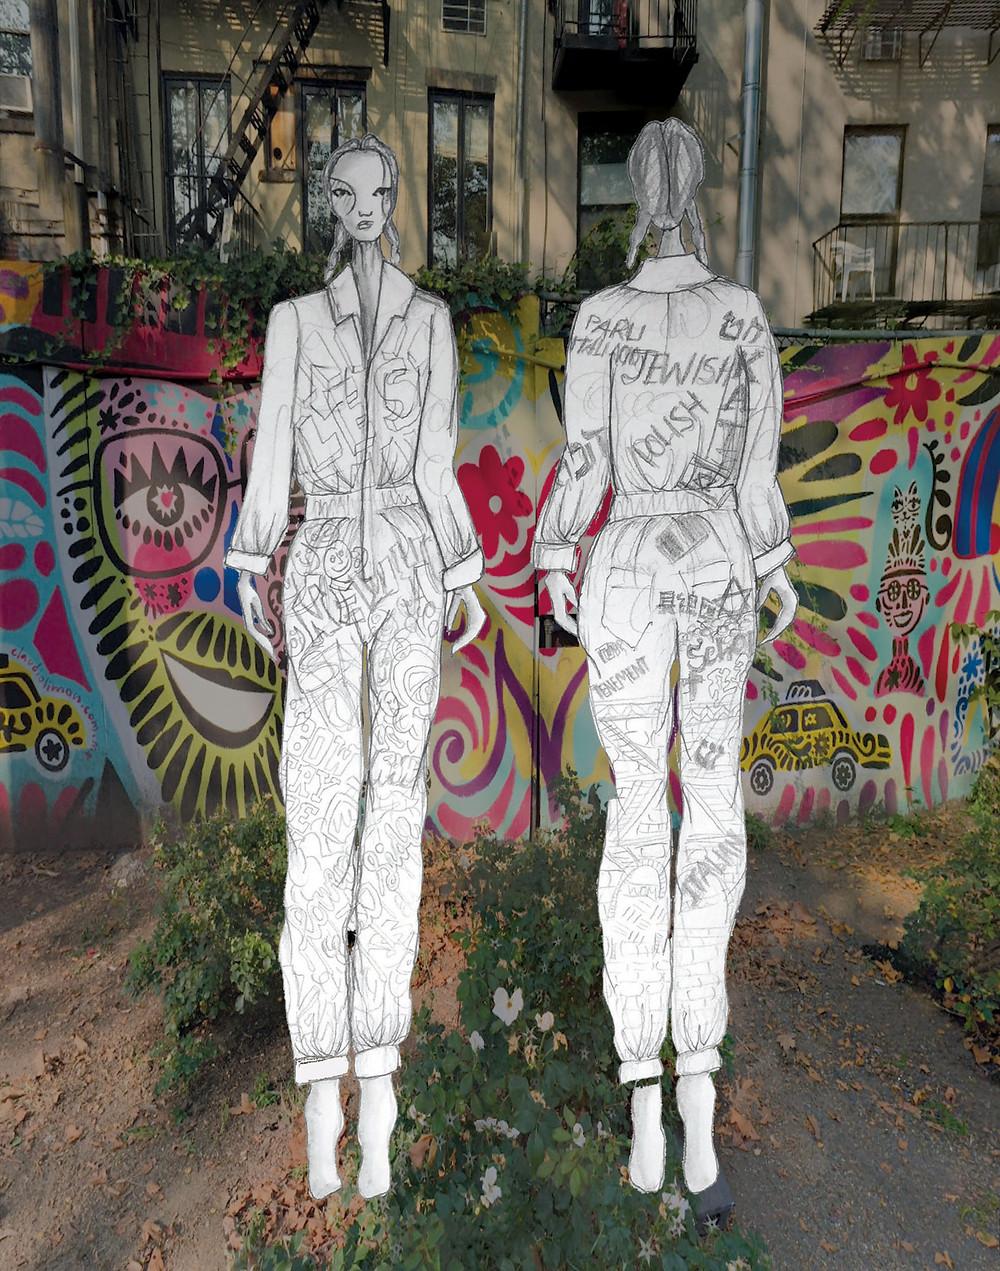 Lower East Side: illustration by Mikki Mccann